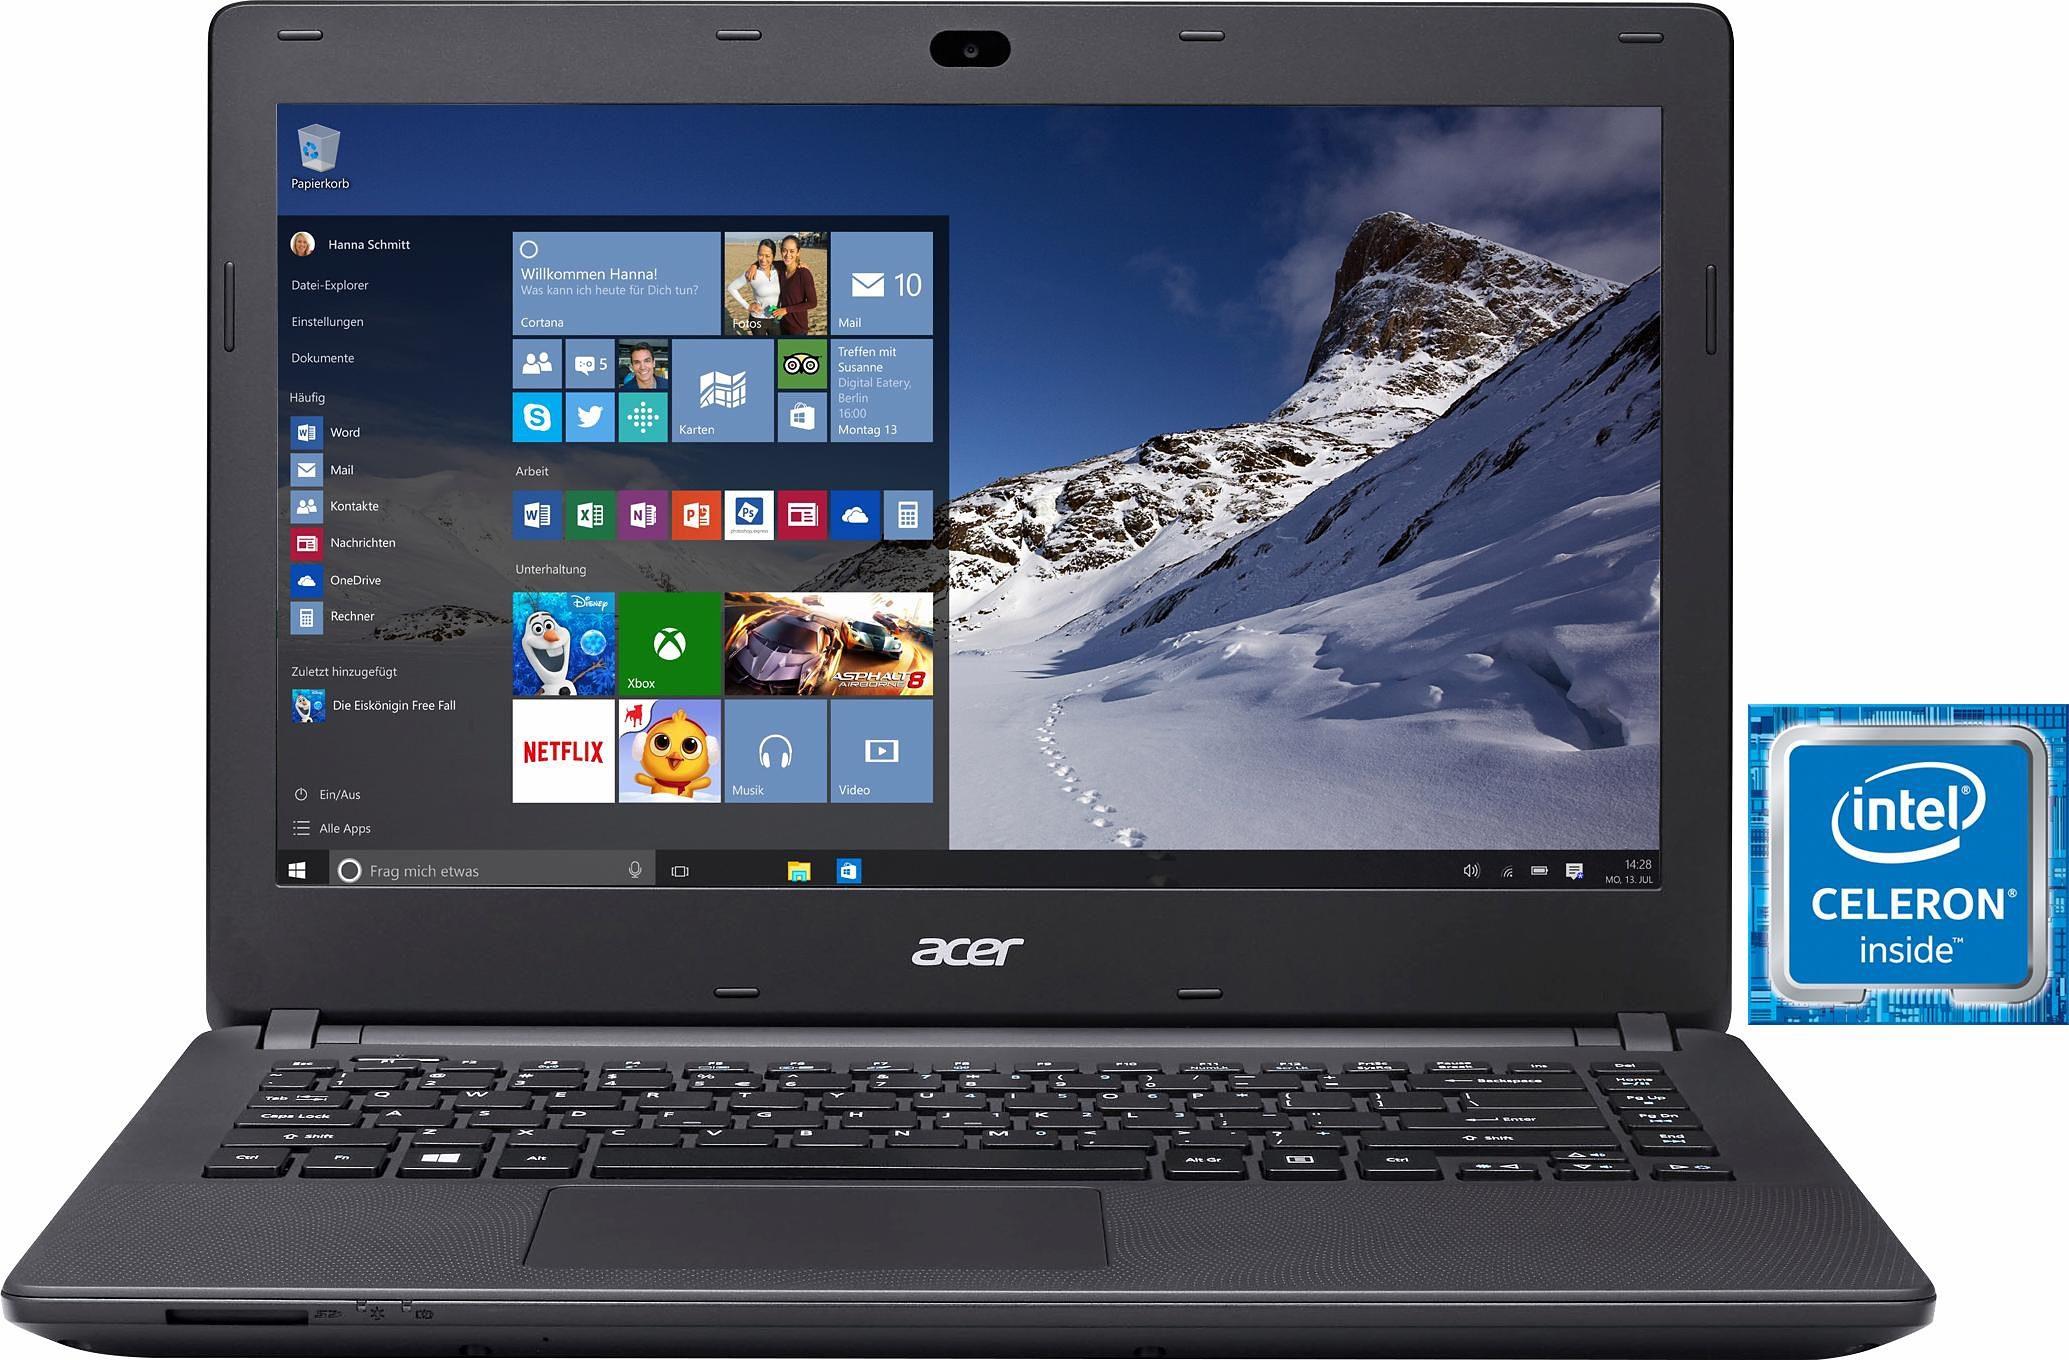 Acer Acer Aspire ES1-431-C5YC Notebook, Intel® Celeron™, 35,6 cm (14 Zoll), 32 GB Speicher